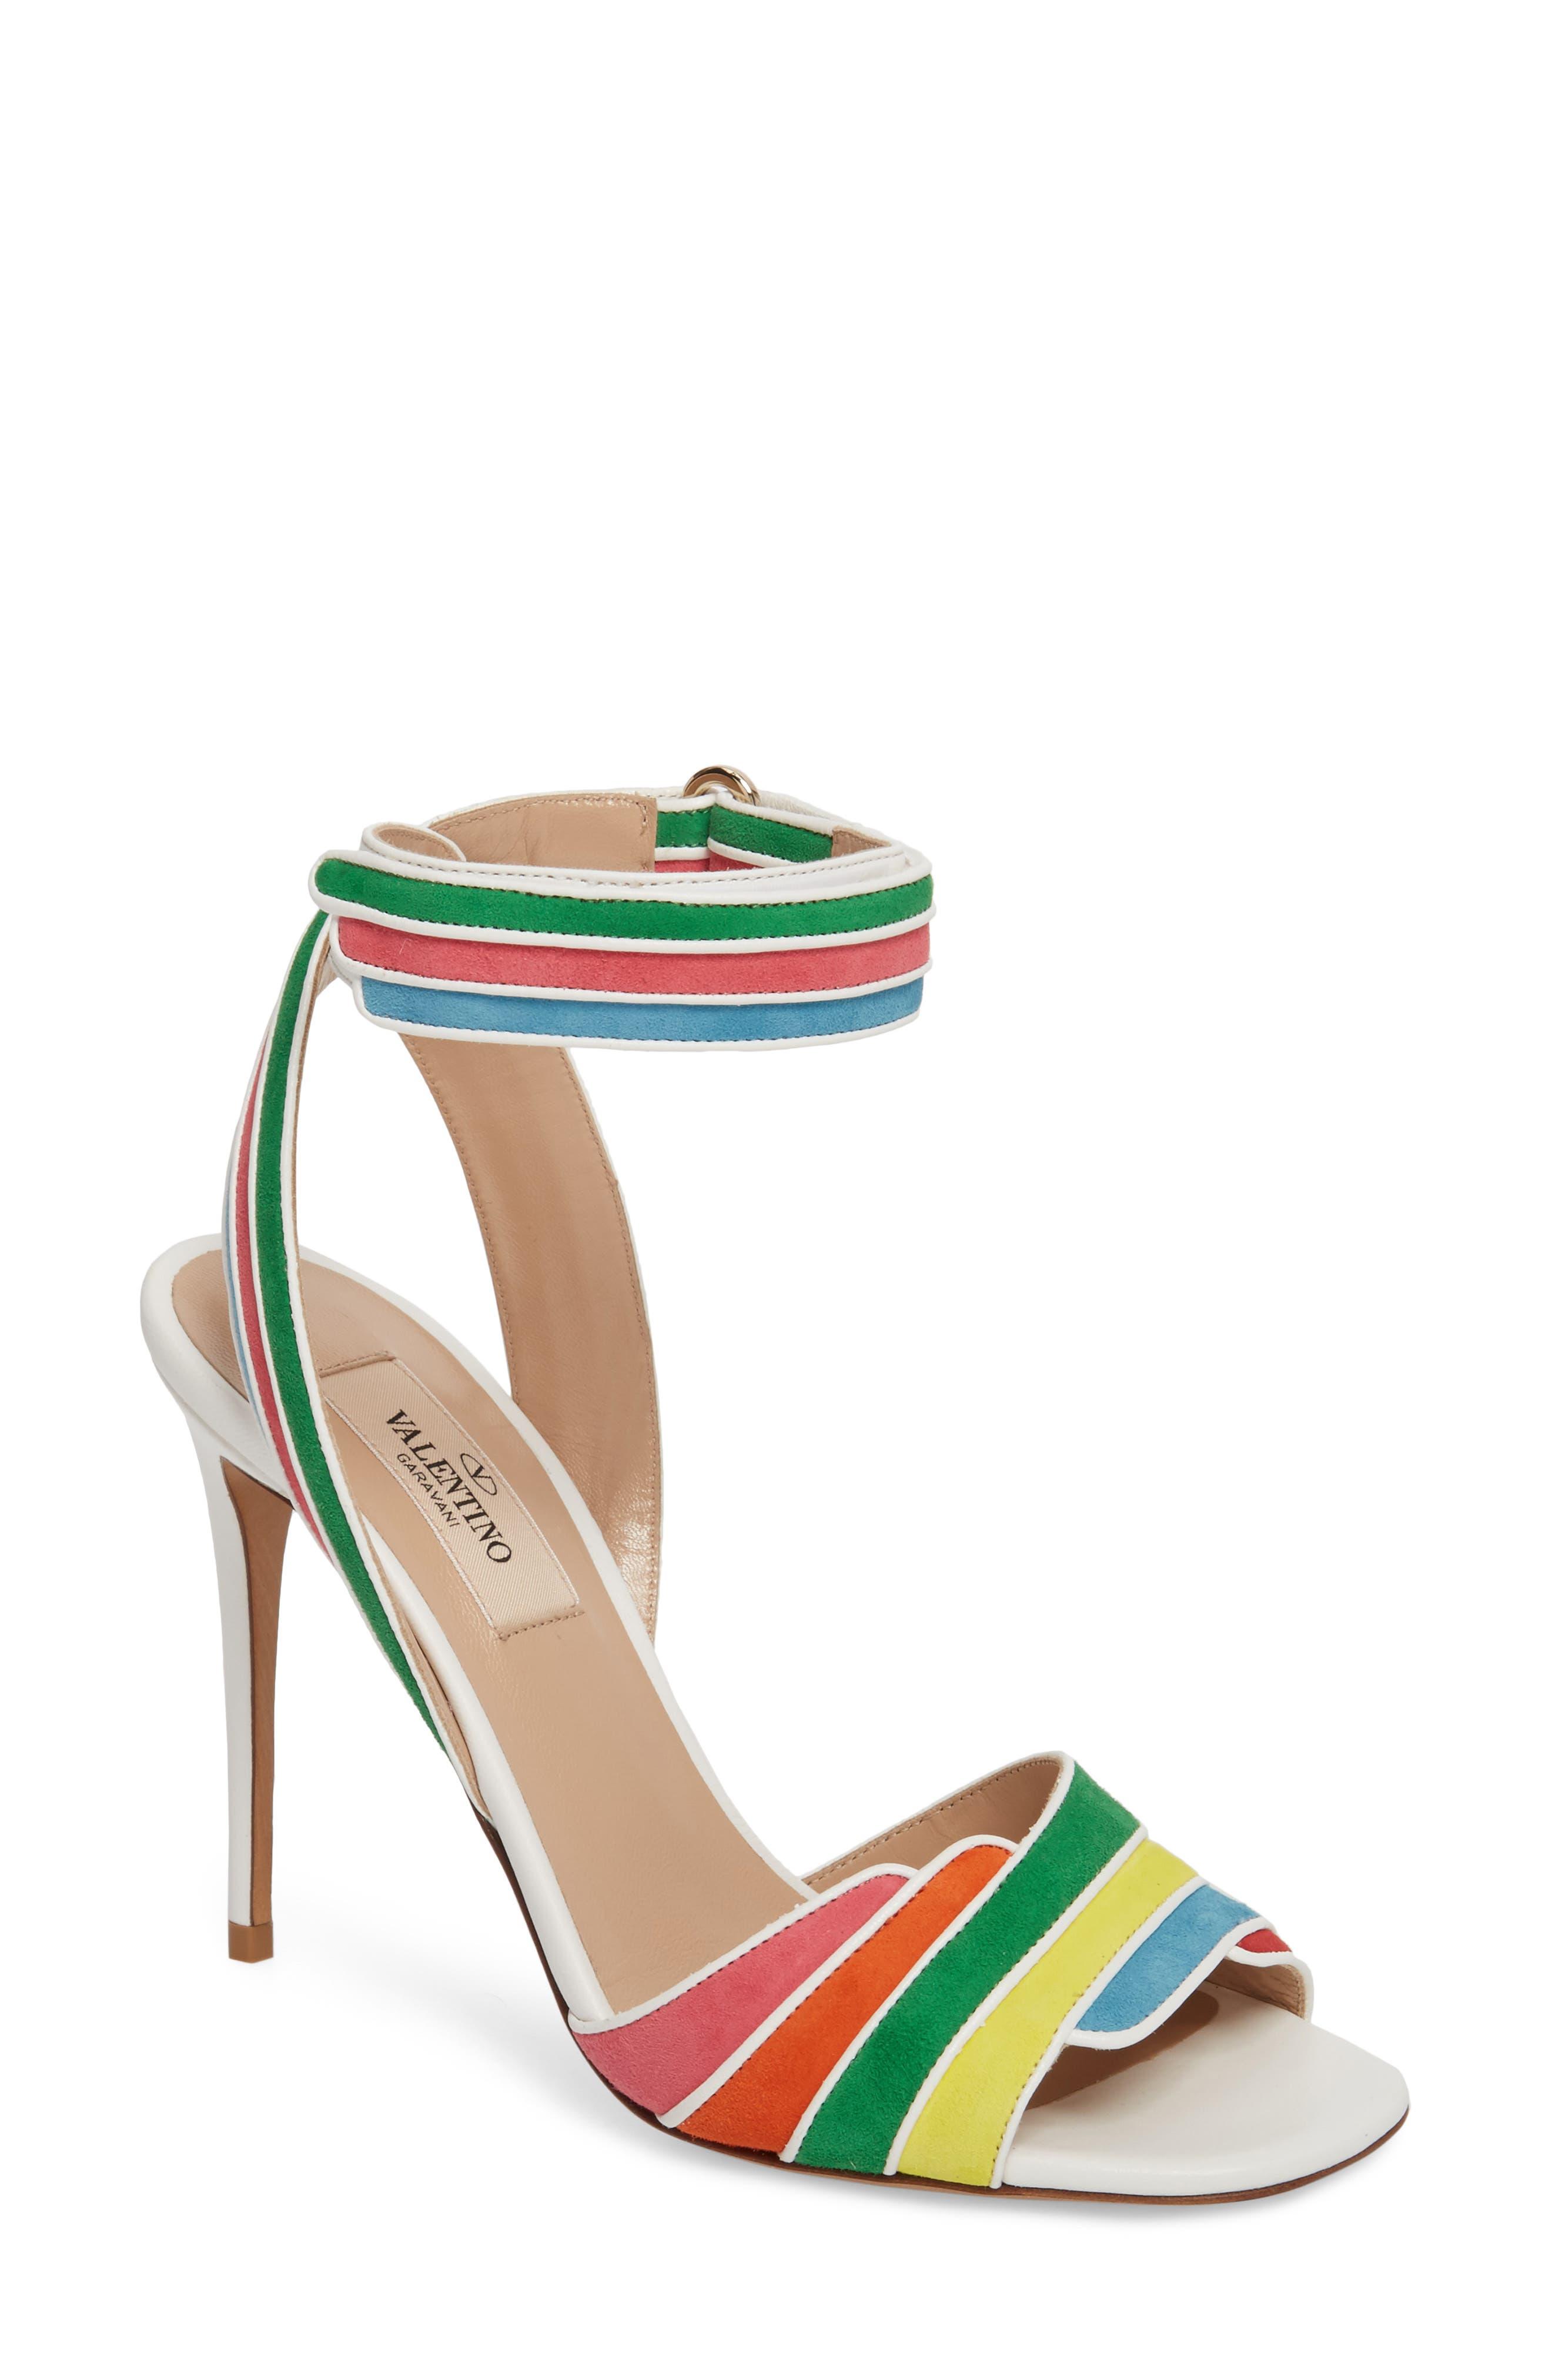 Alternate Image 1 Selected - VALENTINO GARAVANI Rainbow Sandal (Women)